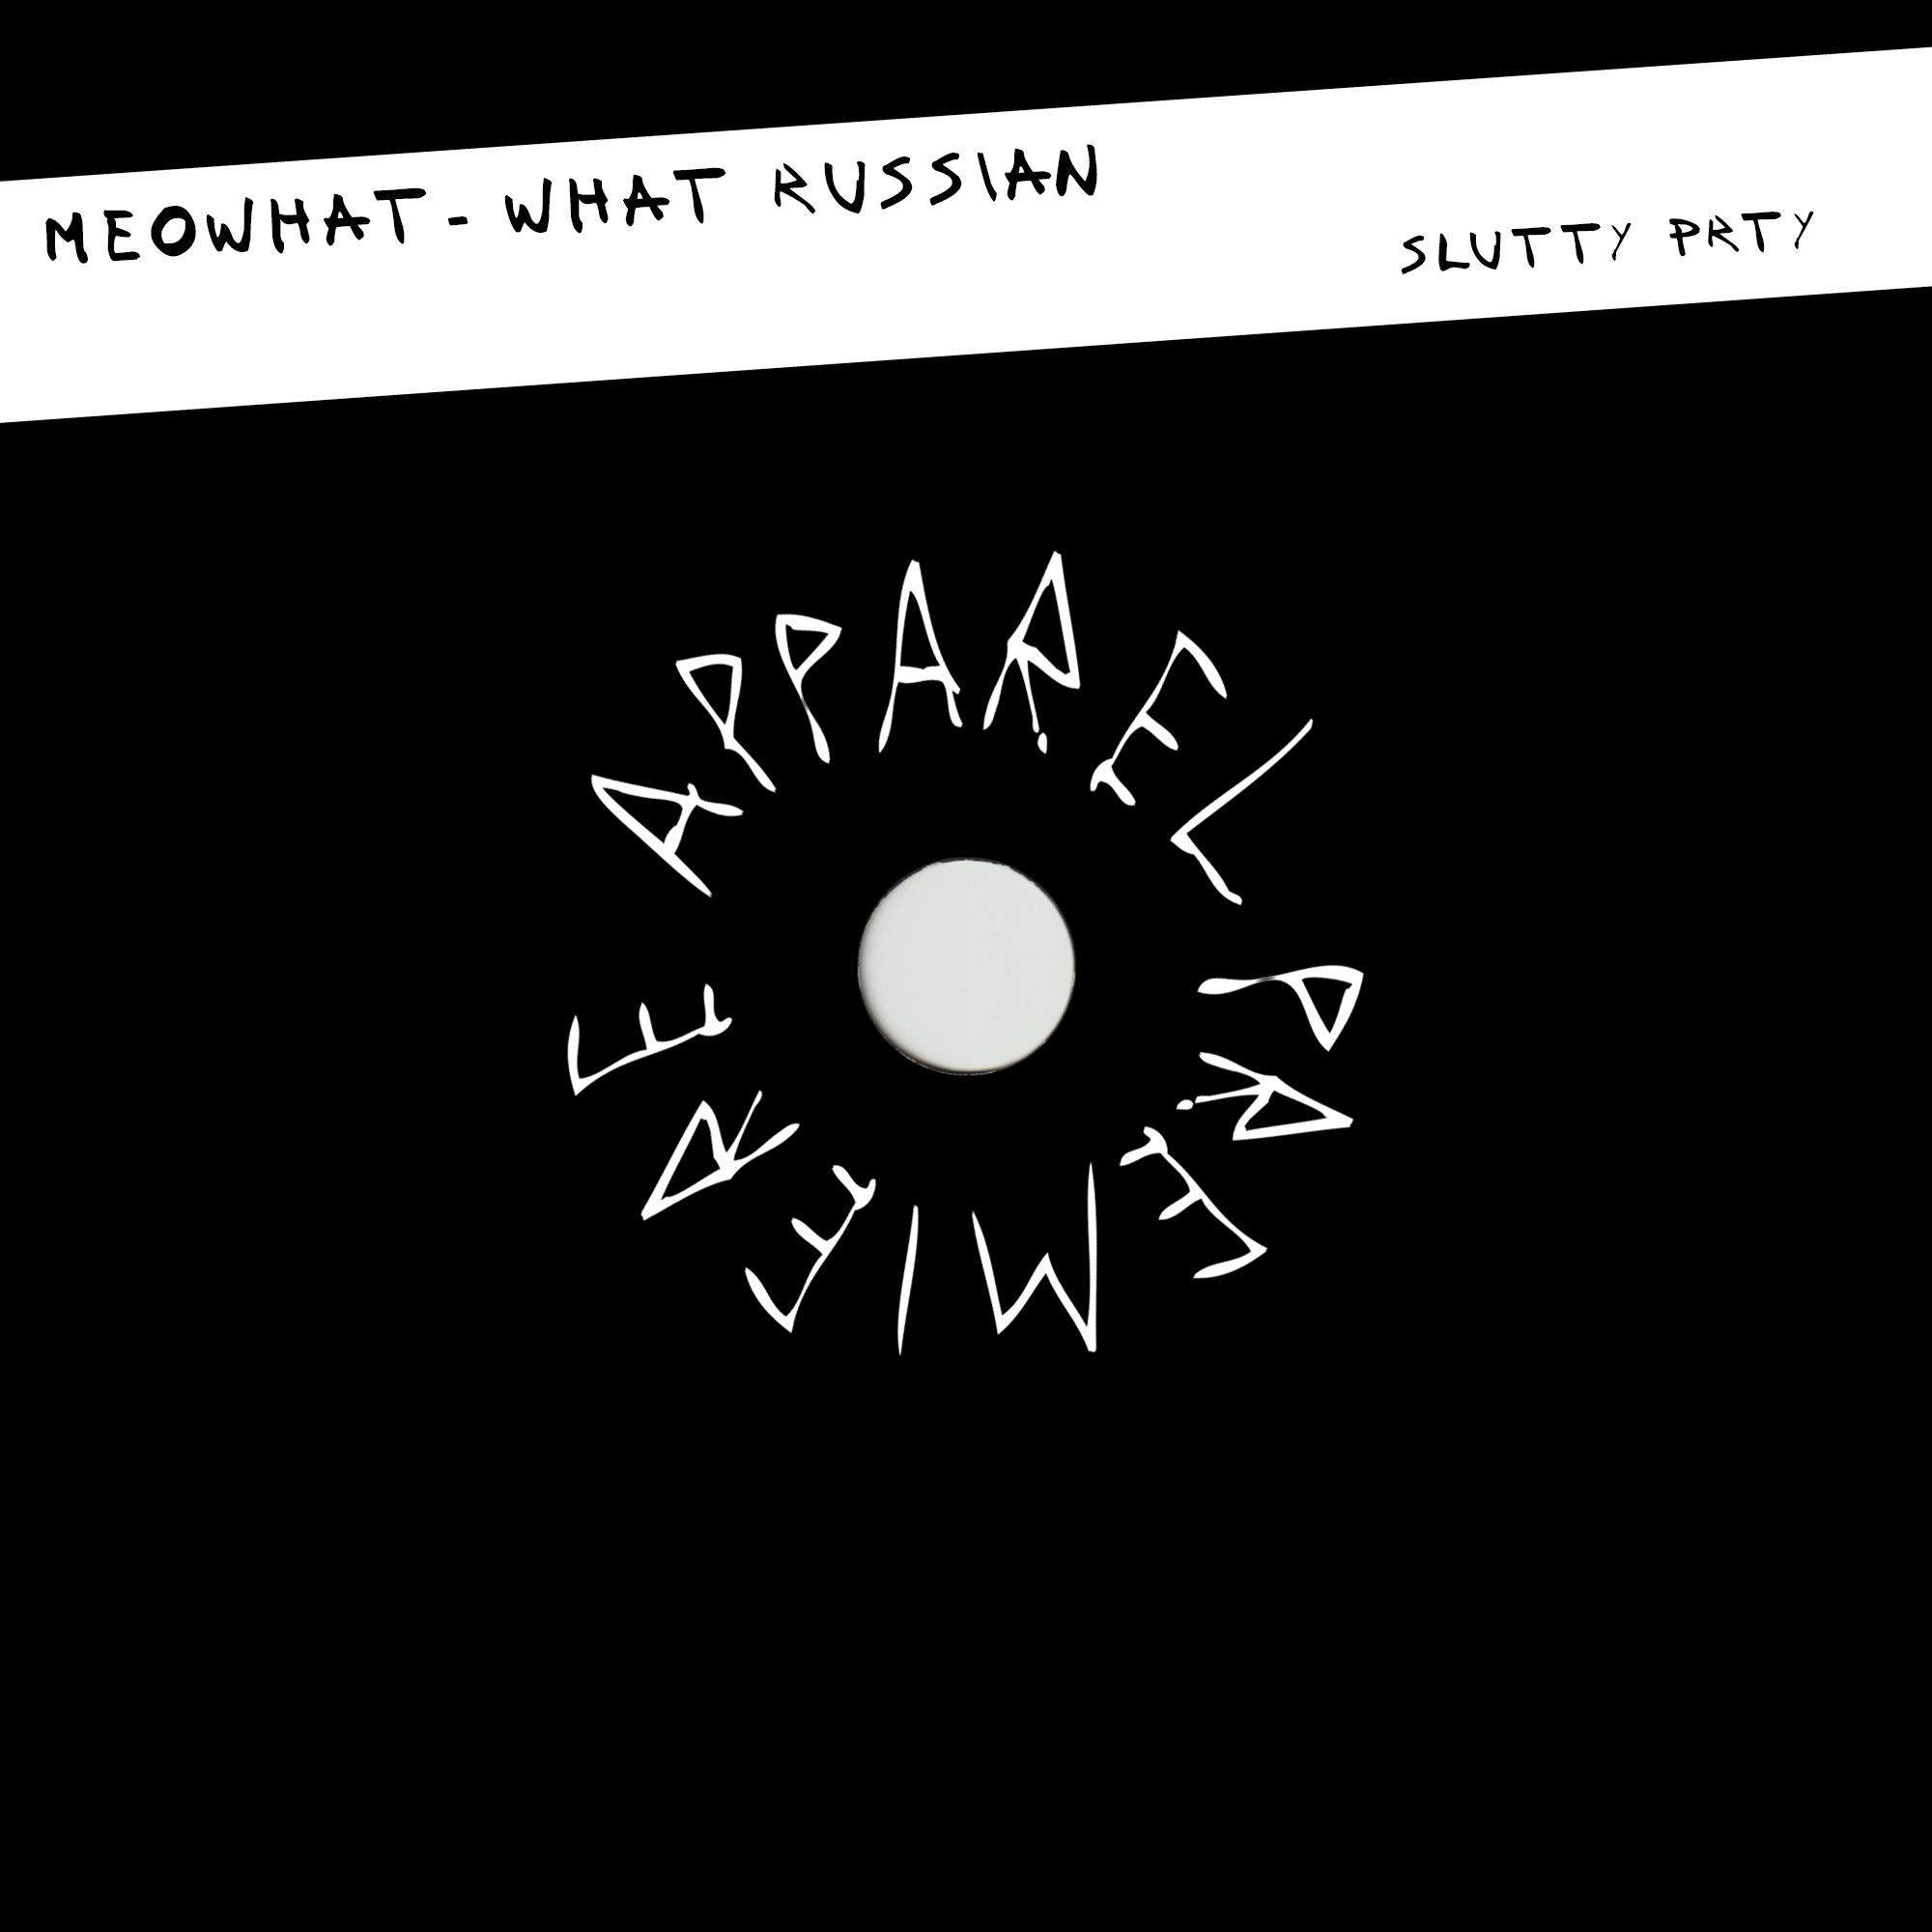 APPAREL PREMIERE: MEOWHAT – What Russian [Slutty Prty]